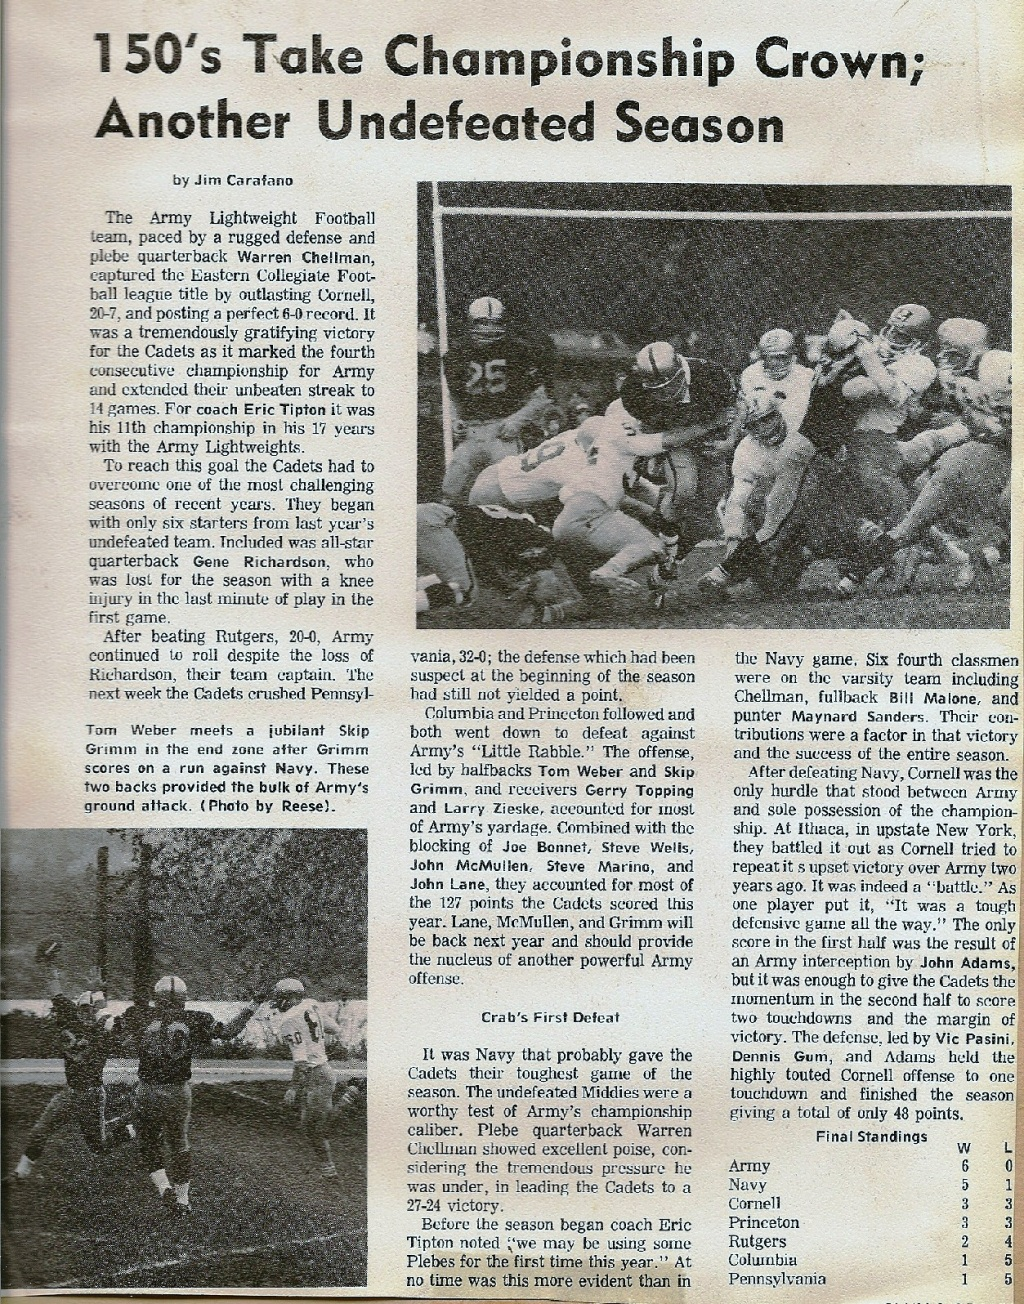 ArmyLFB_1973_111073_SlumnGravy